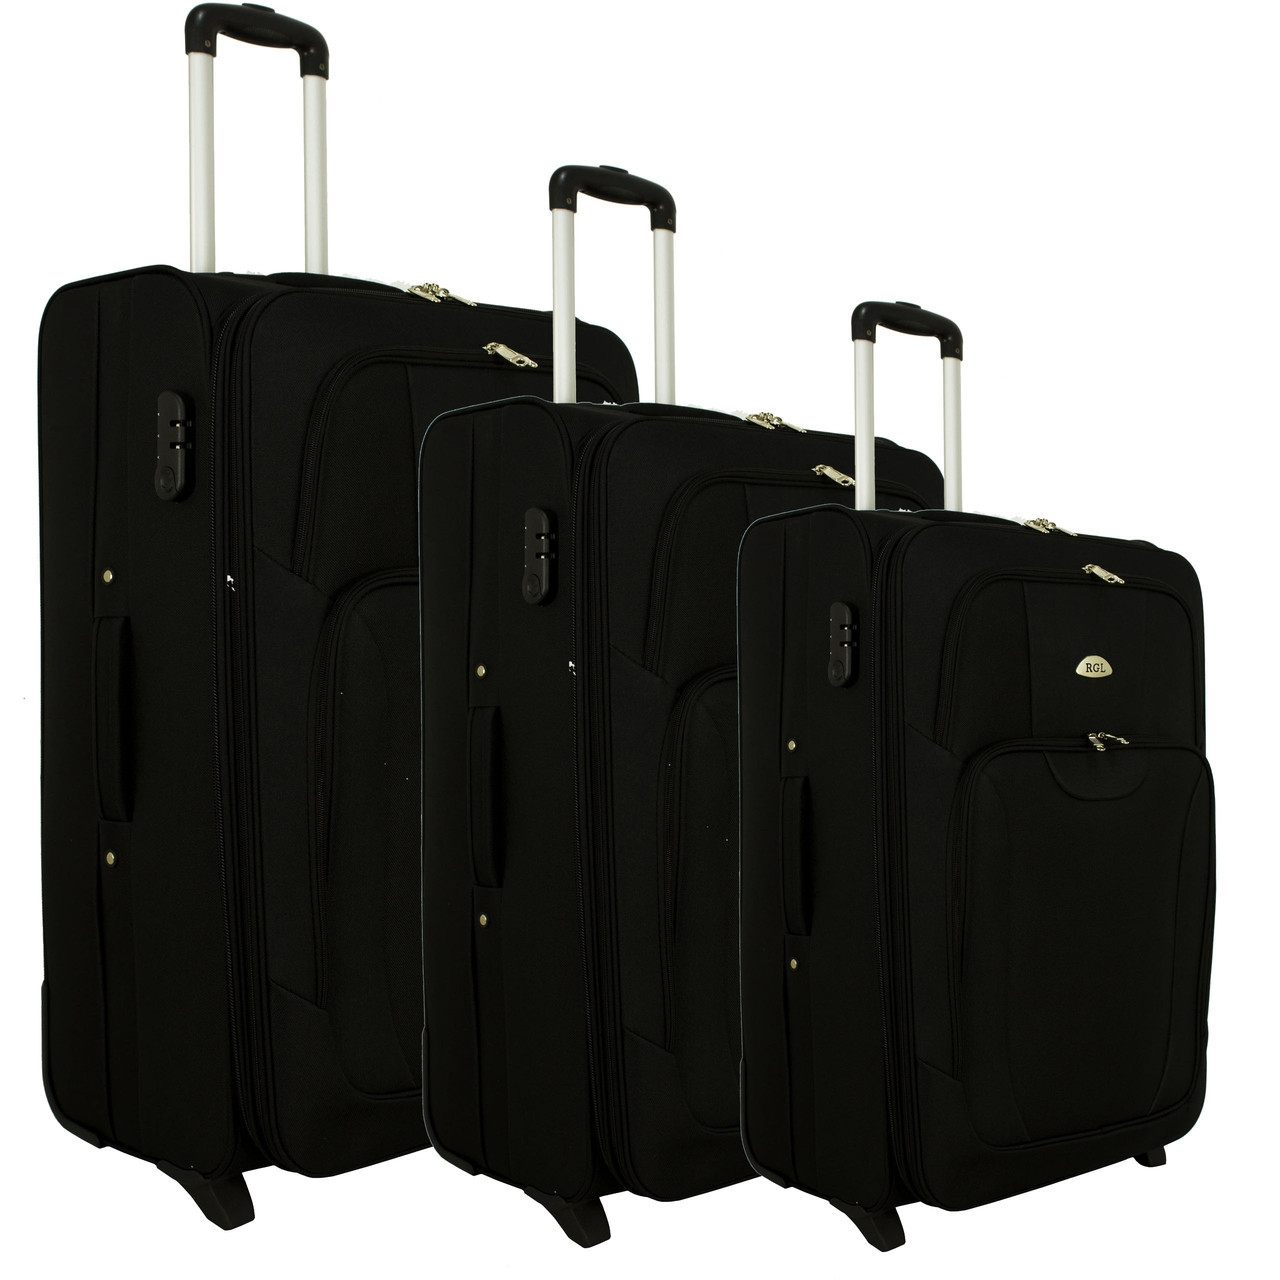 e6139229b5be Чемодан сумка RGL 1003 набор 3 штуки черный: продажа, цена в Луцке ...